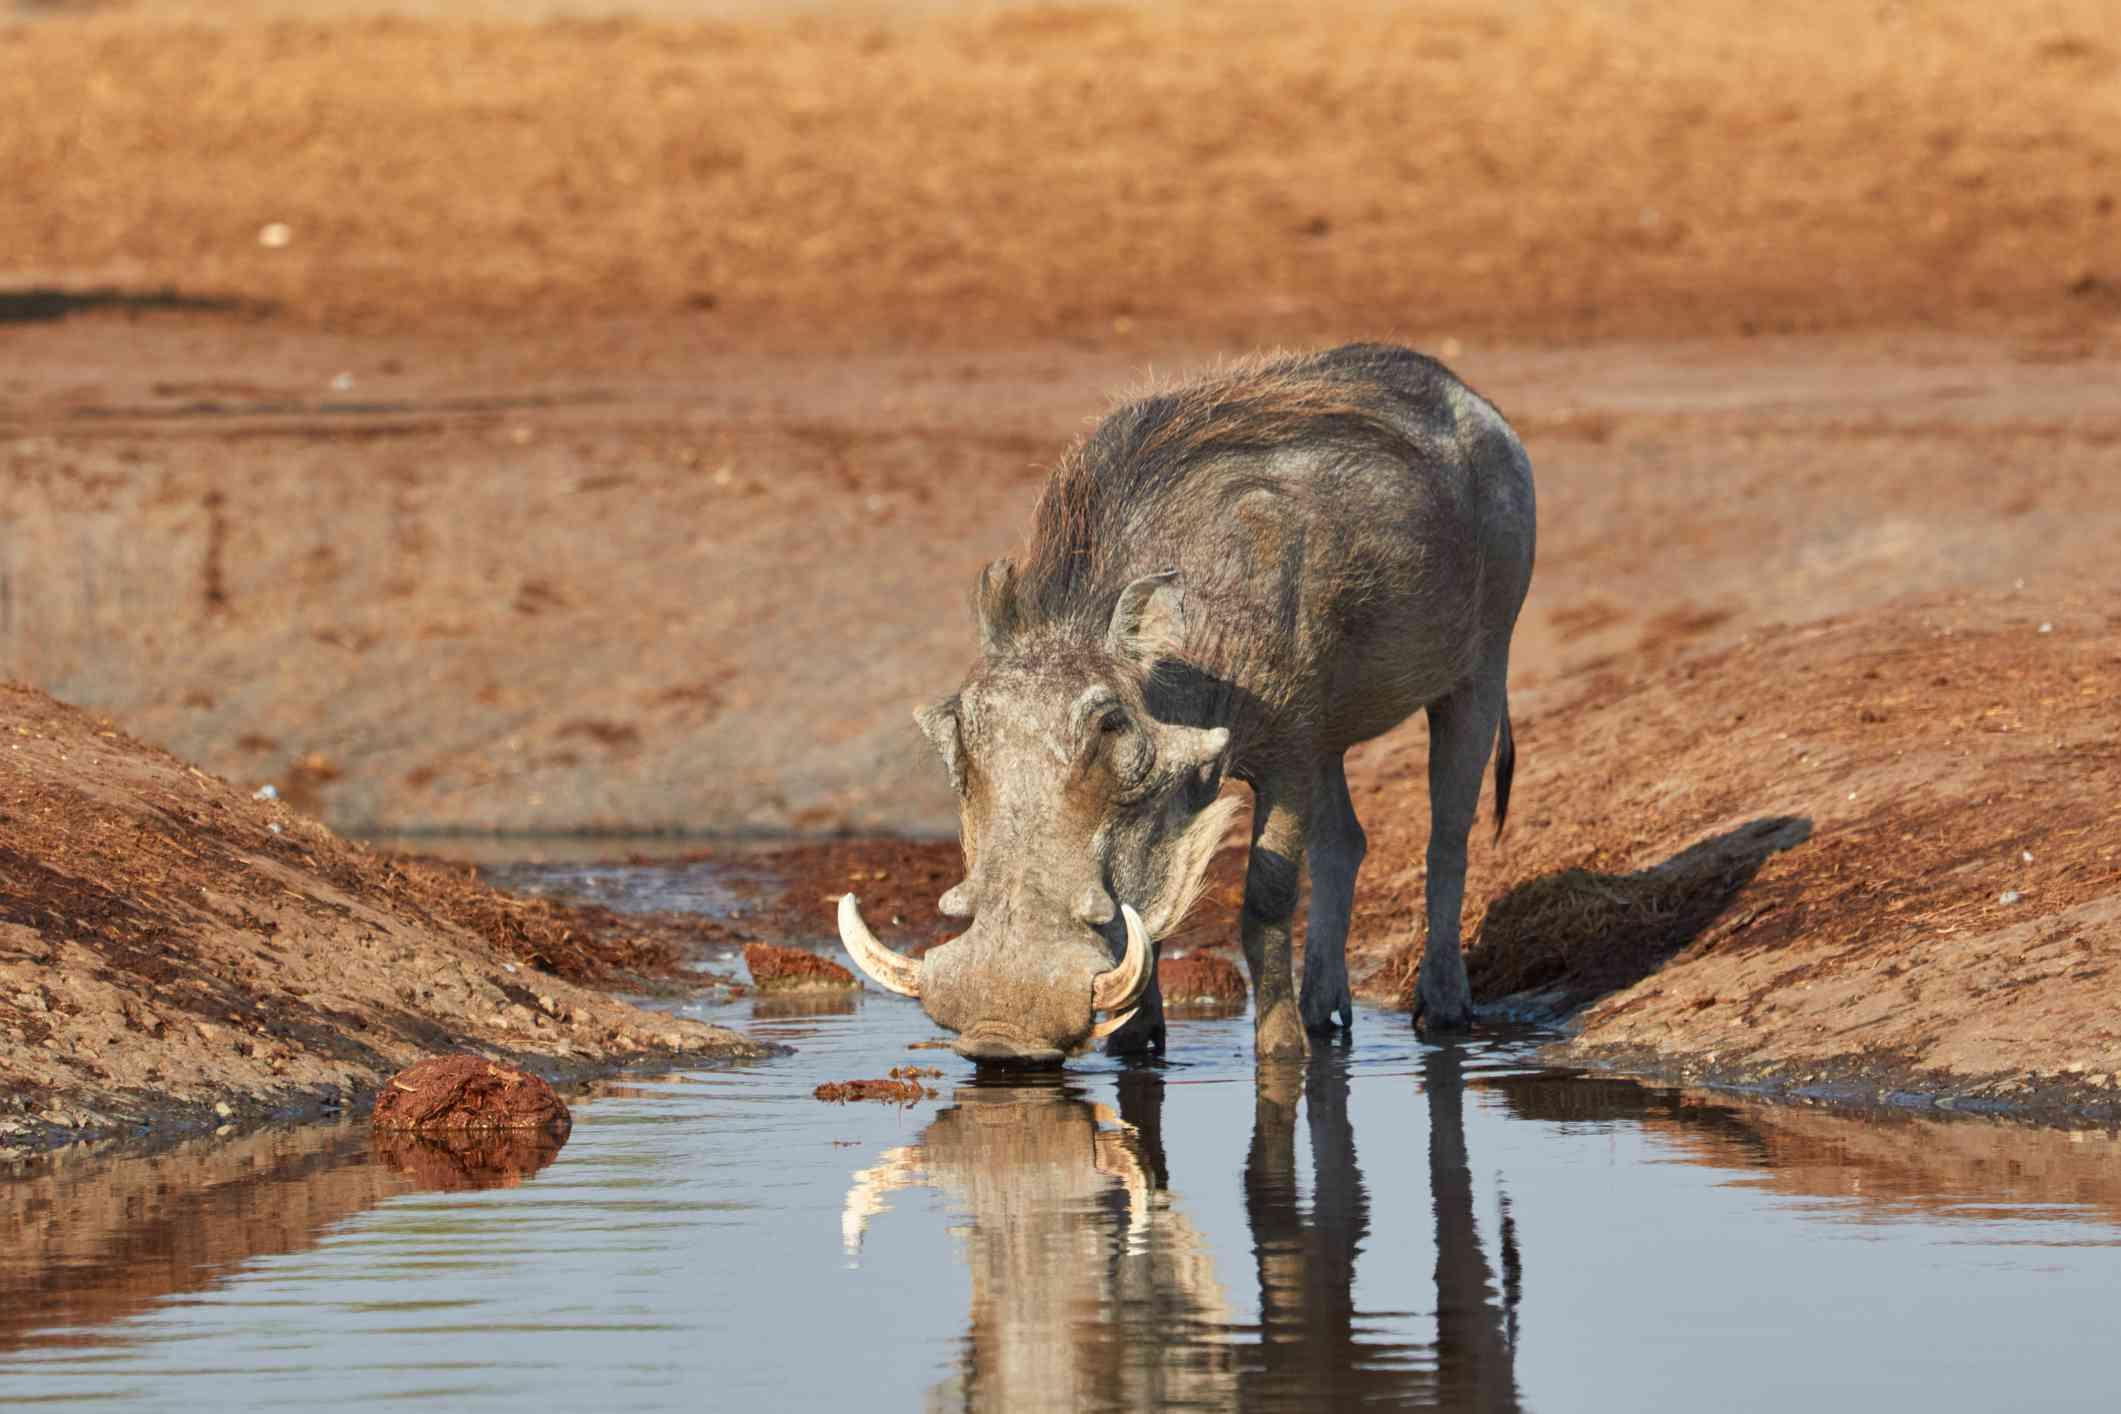 warthog drinking water at river